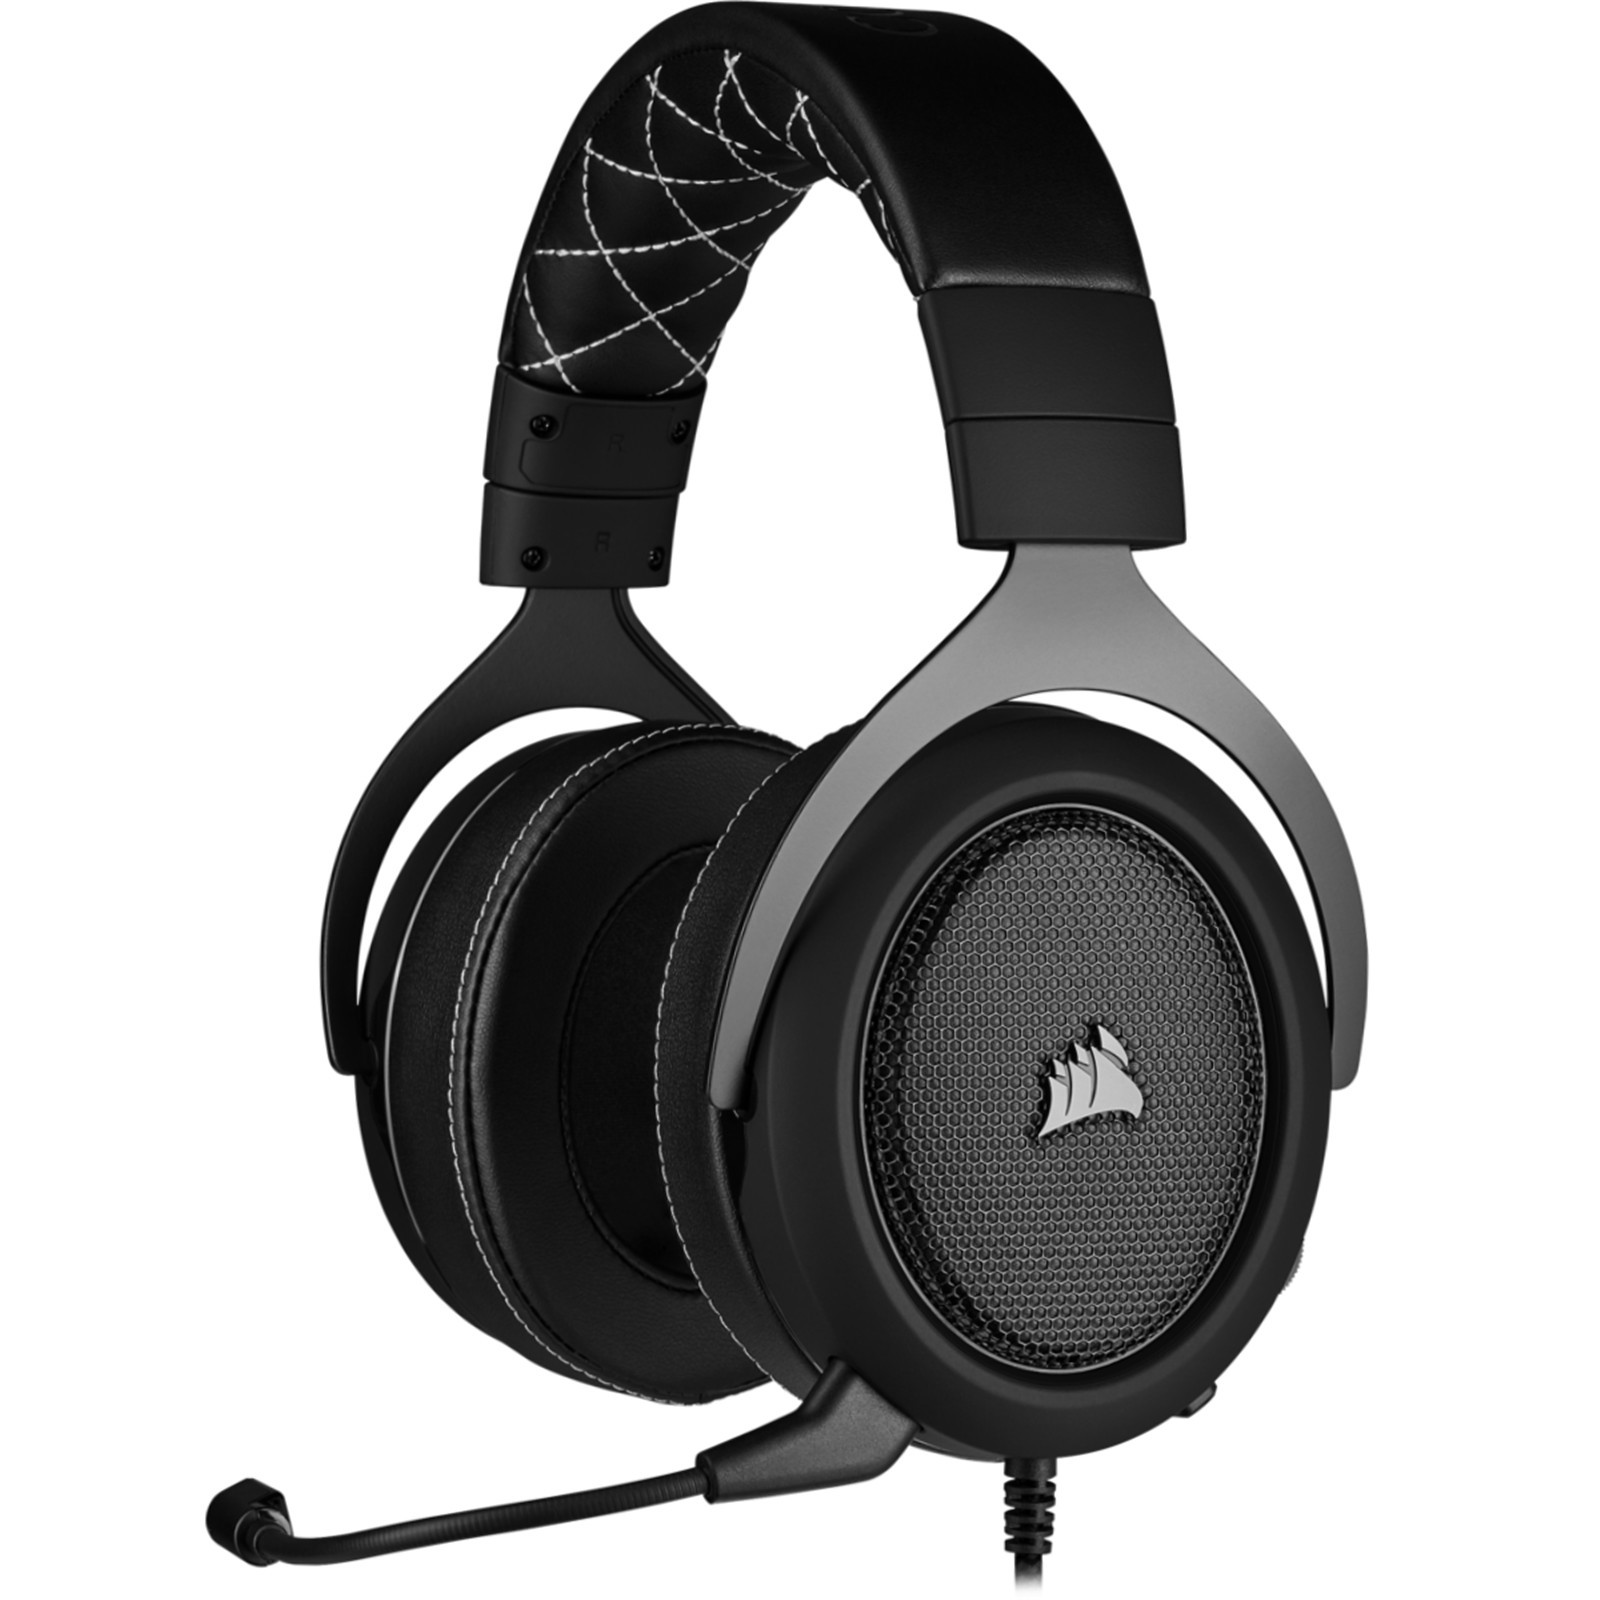 Tai nghe Corsair HS60 Pro Surround CA-9011213-AP